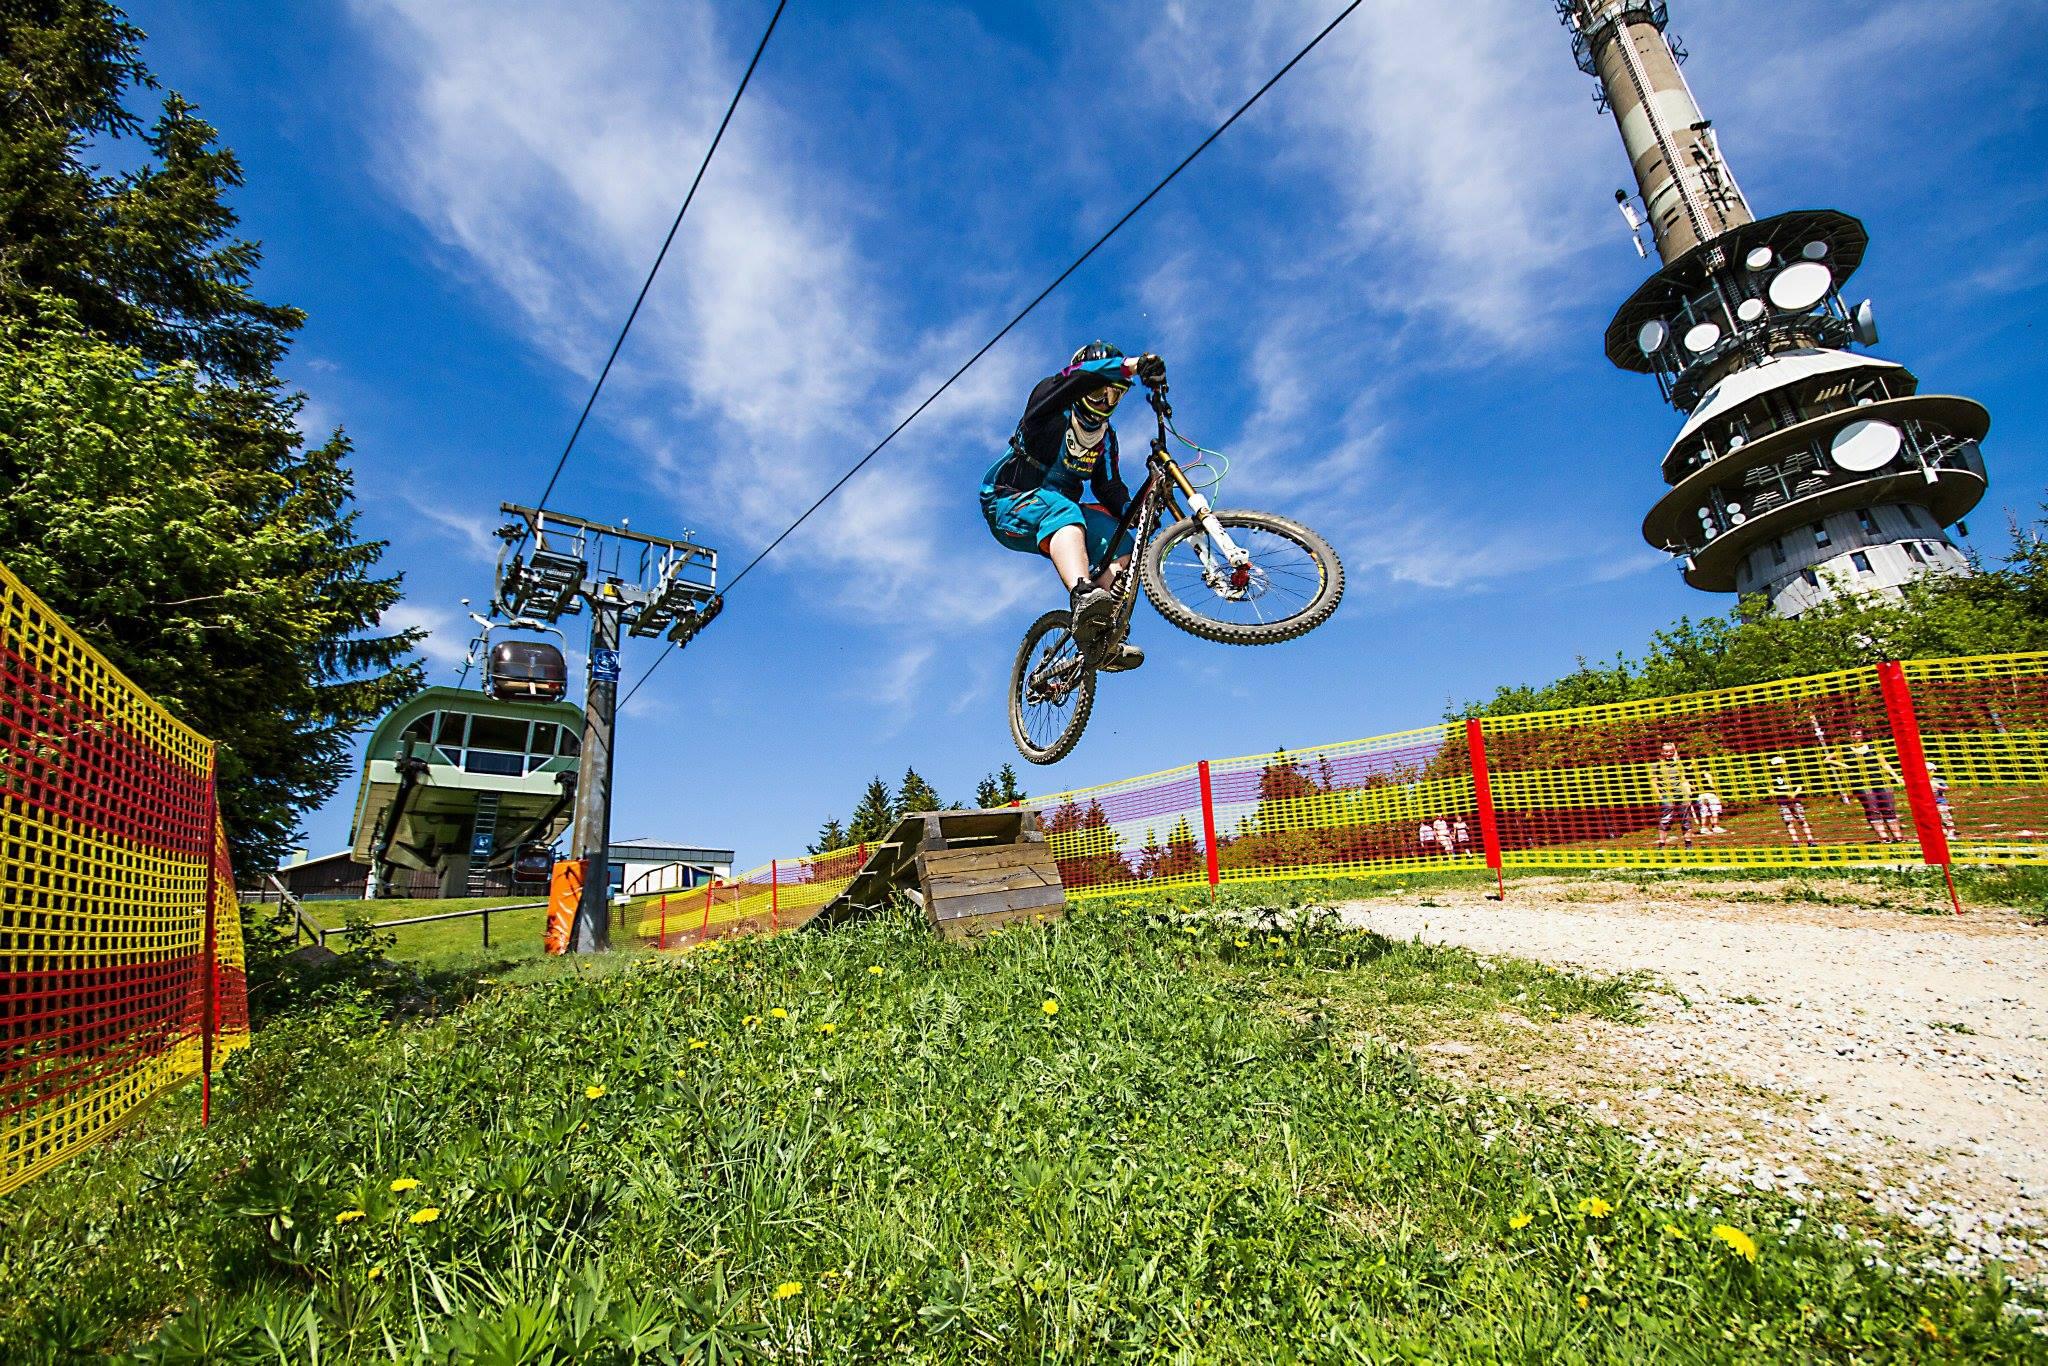 Robin Appenroth Team Biking is awesome